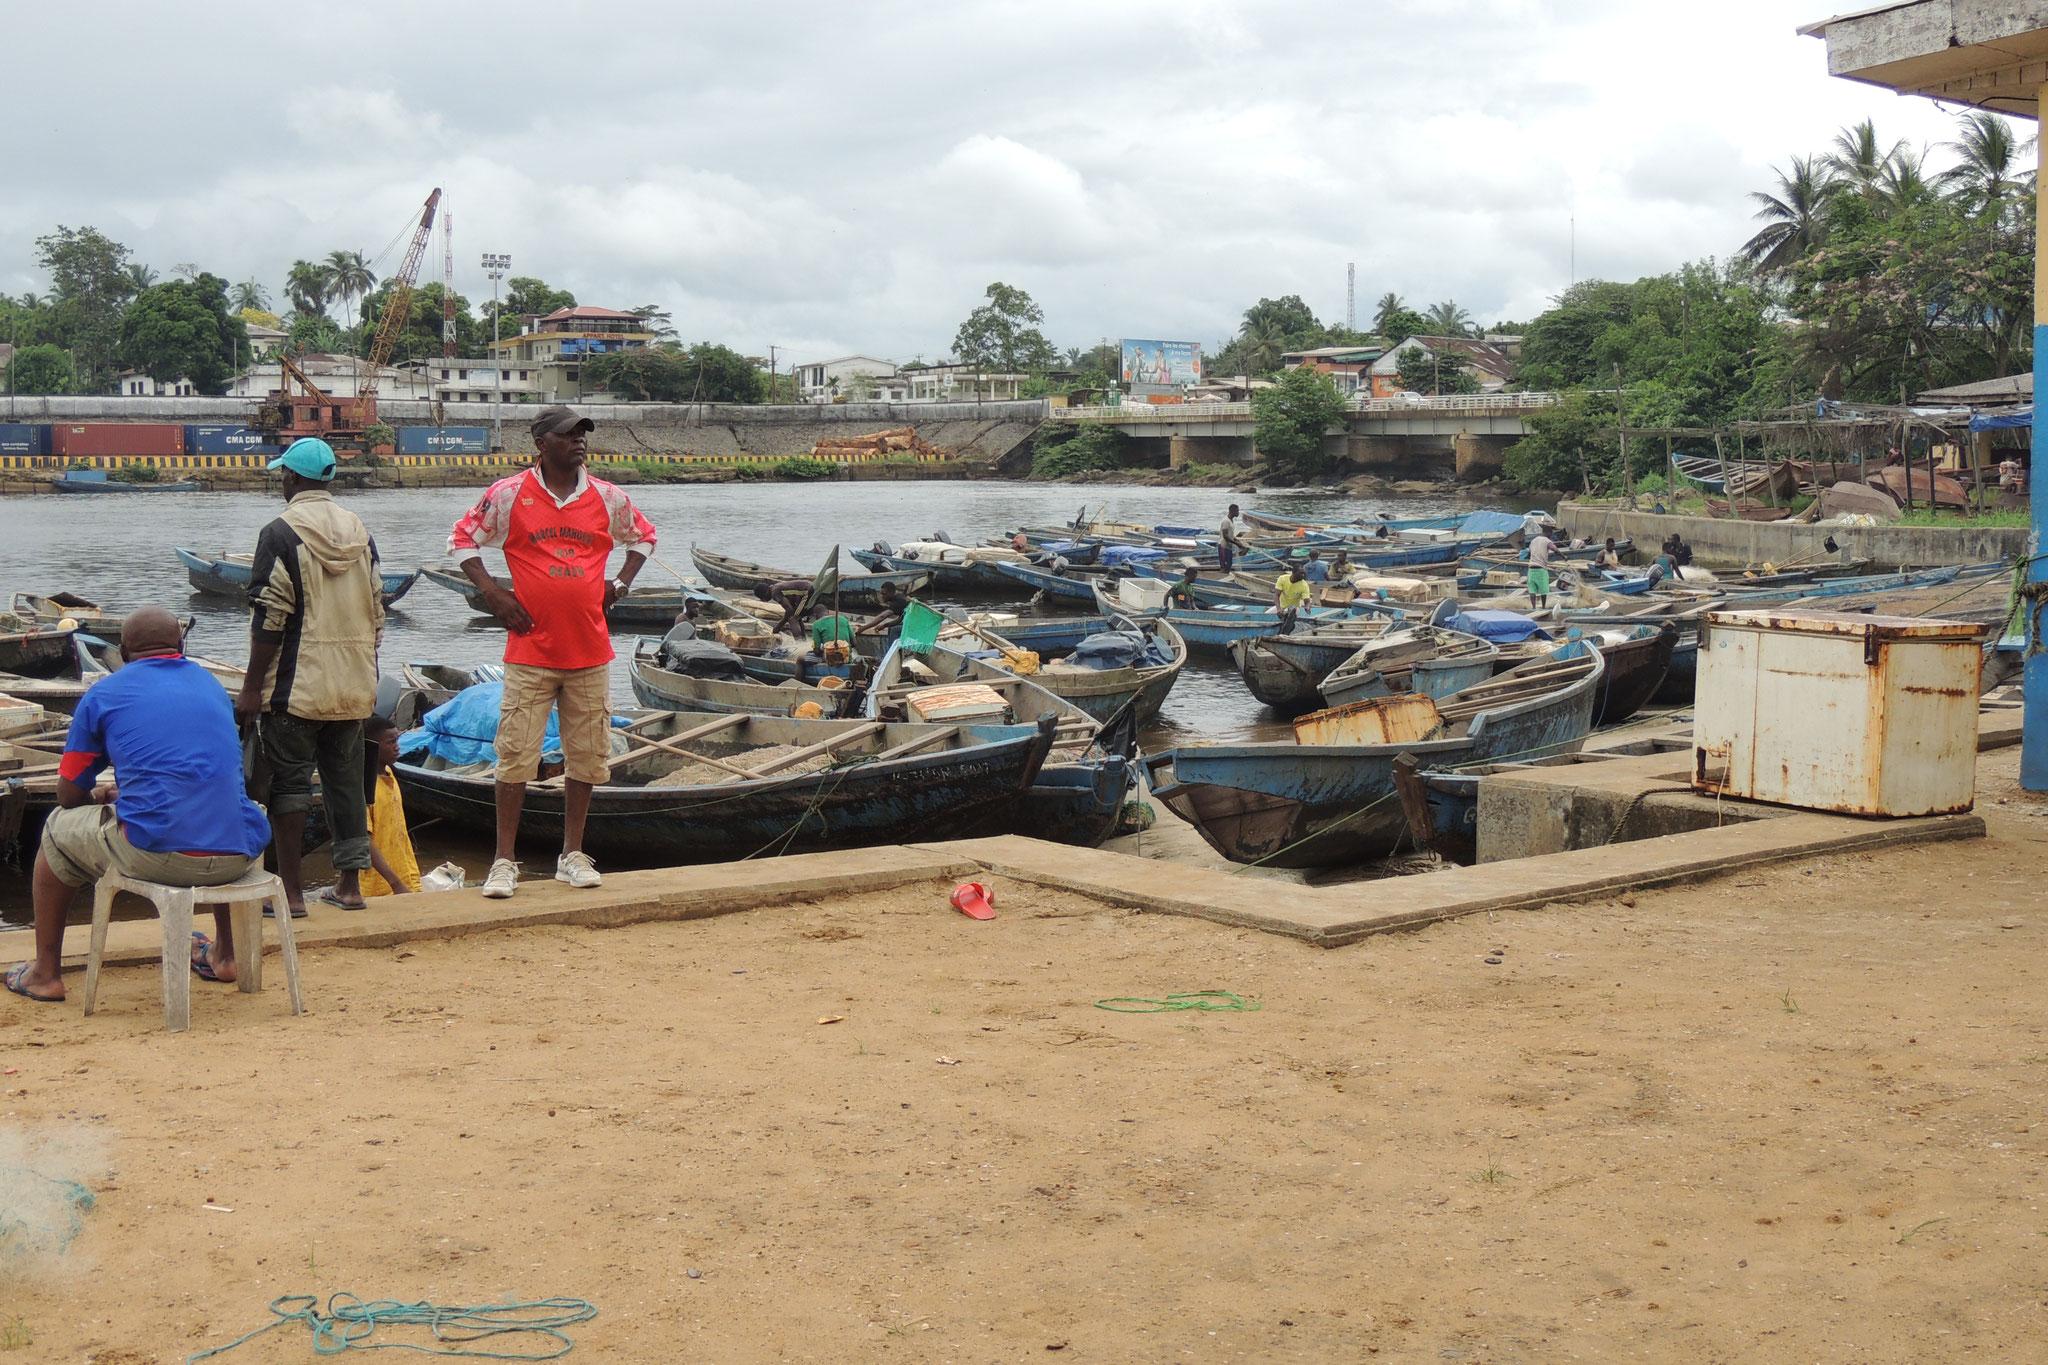 Puerto pesquero de Kribi